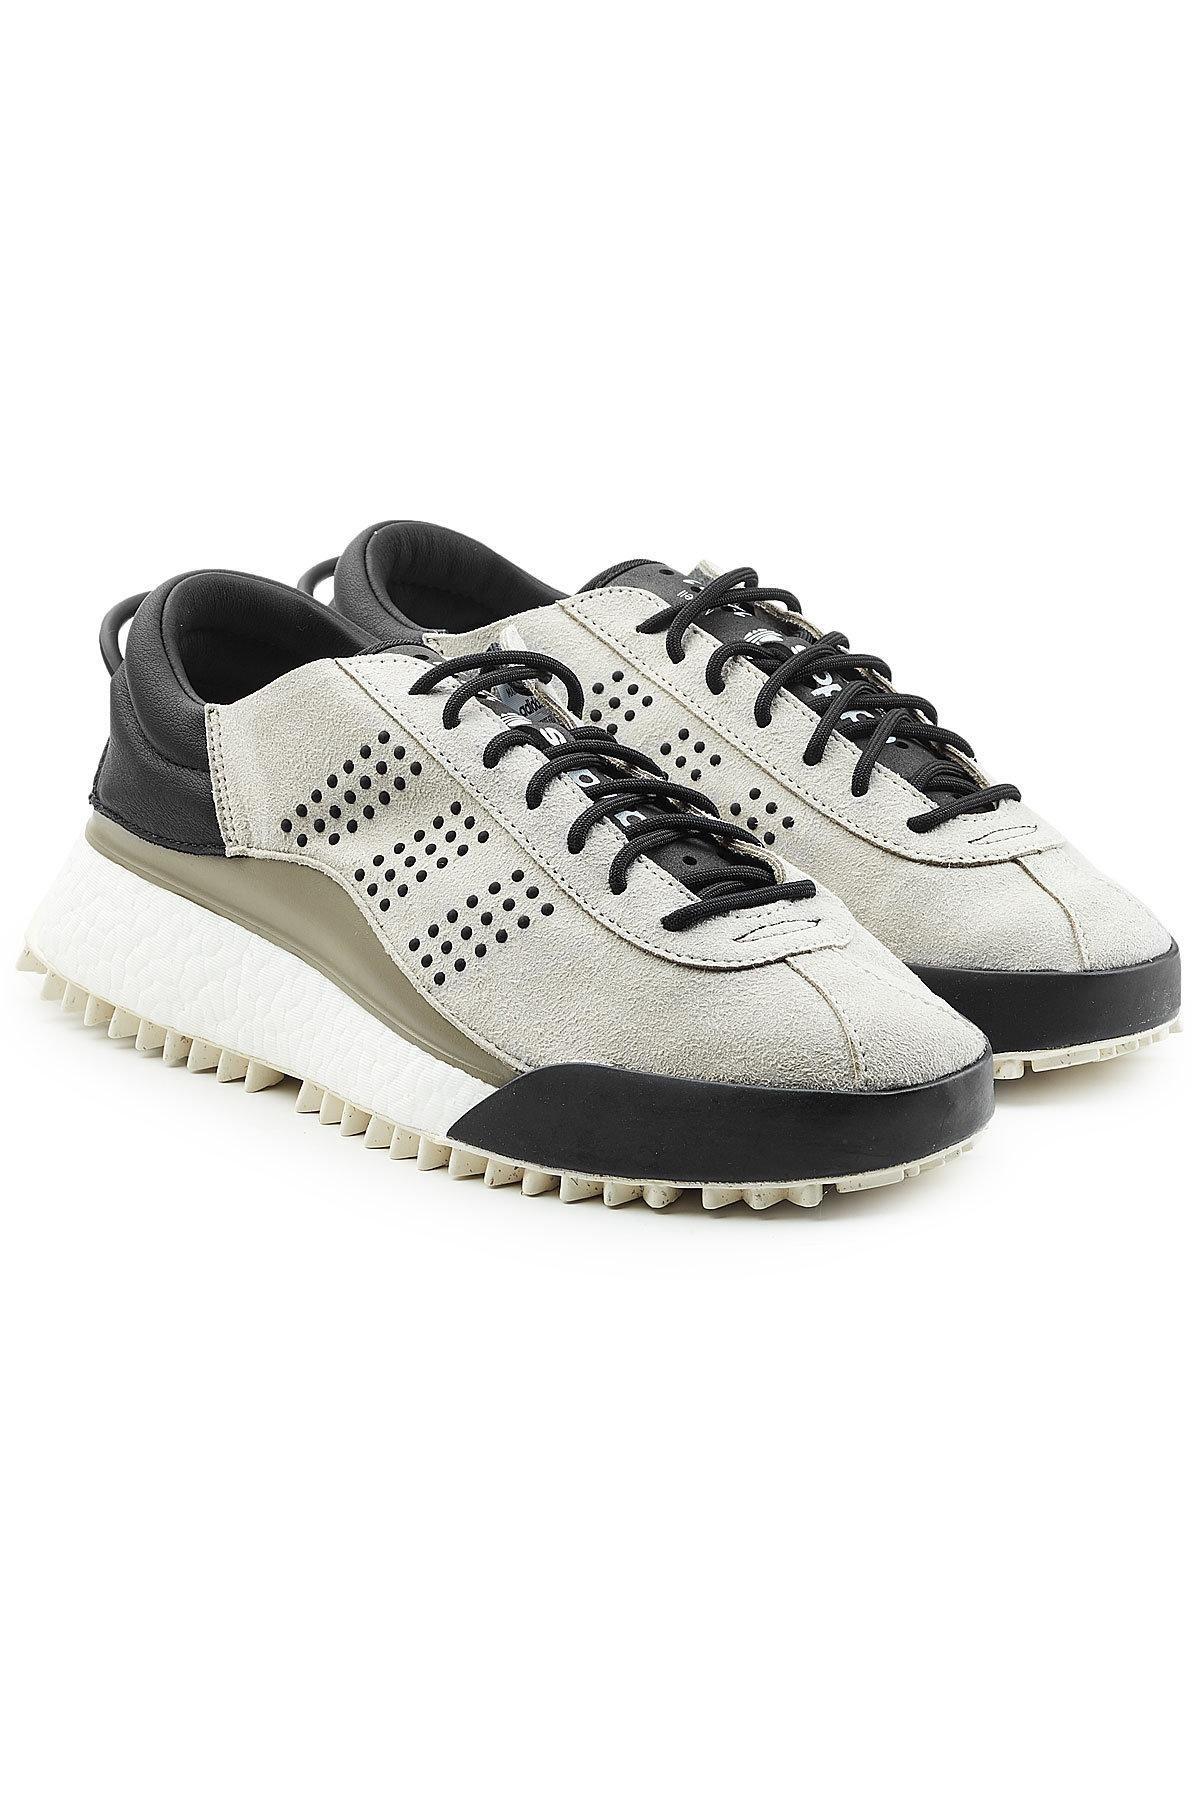 separation shoes 419dc bb5cf mothersday AdoreWe STYLEBOP.com (DE) Low-Tops - adidas Originals by  Alexander Wang Adidas Originals by Alexander Wang Low Top Sneakers Hike mit  Leder und ...